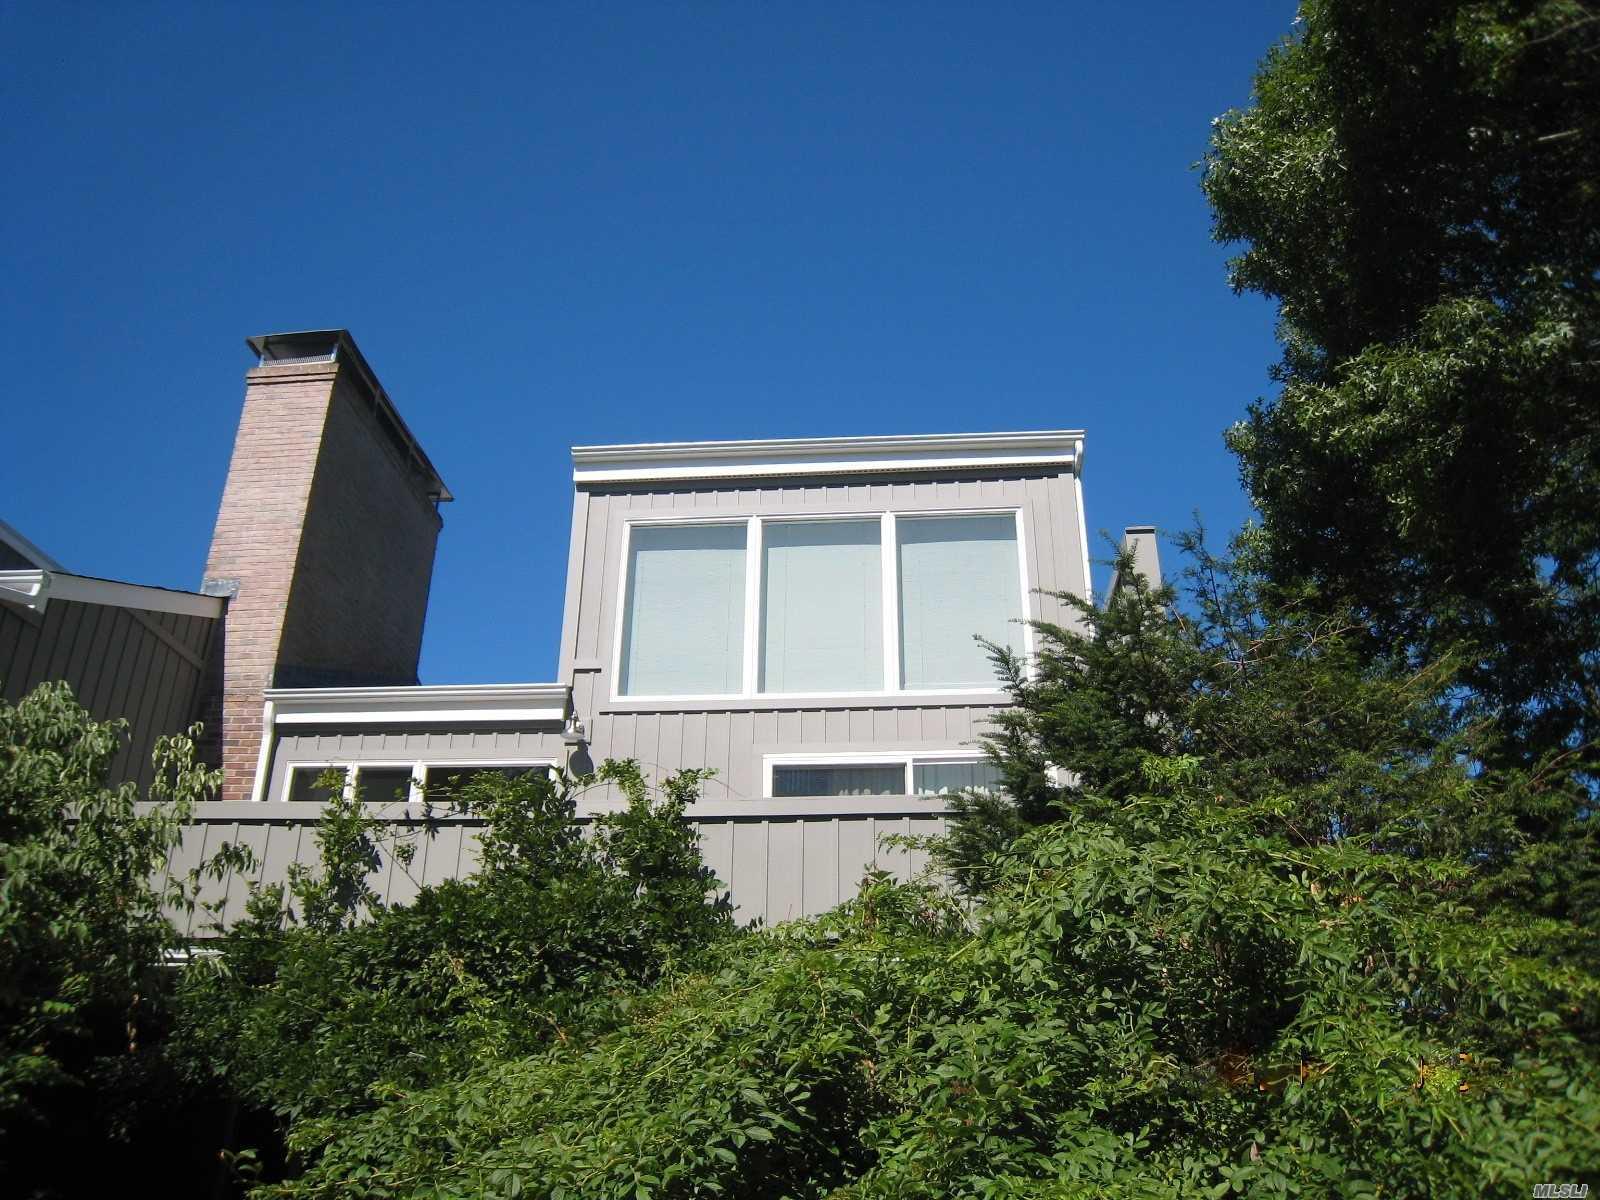 Property for sale at 514 Pantigo Rd, East Hampton,  NY 11937